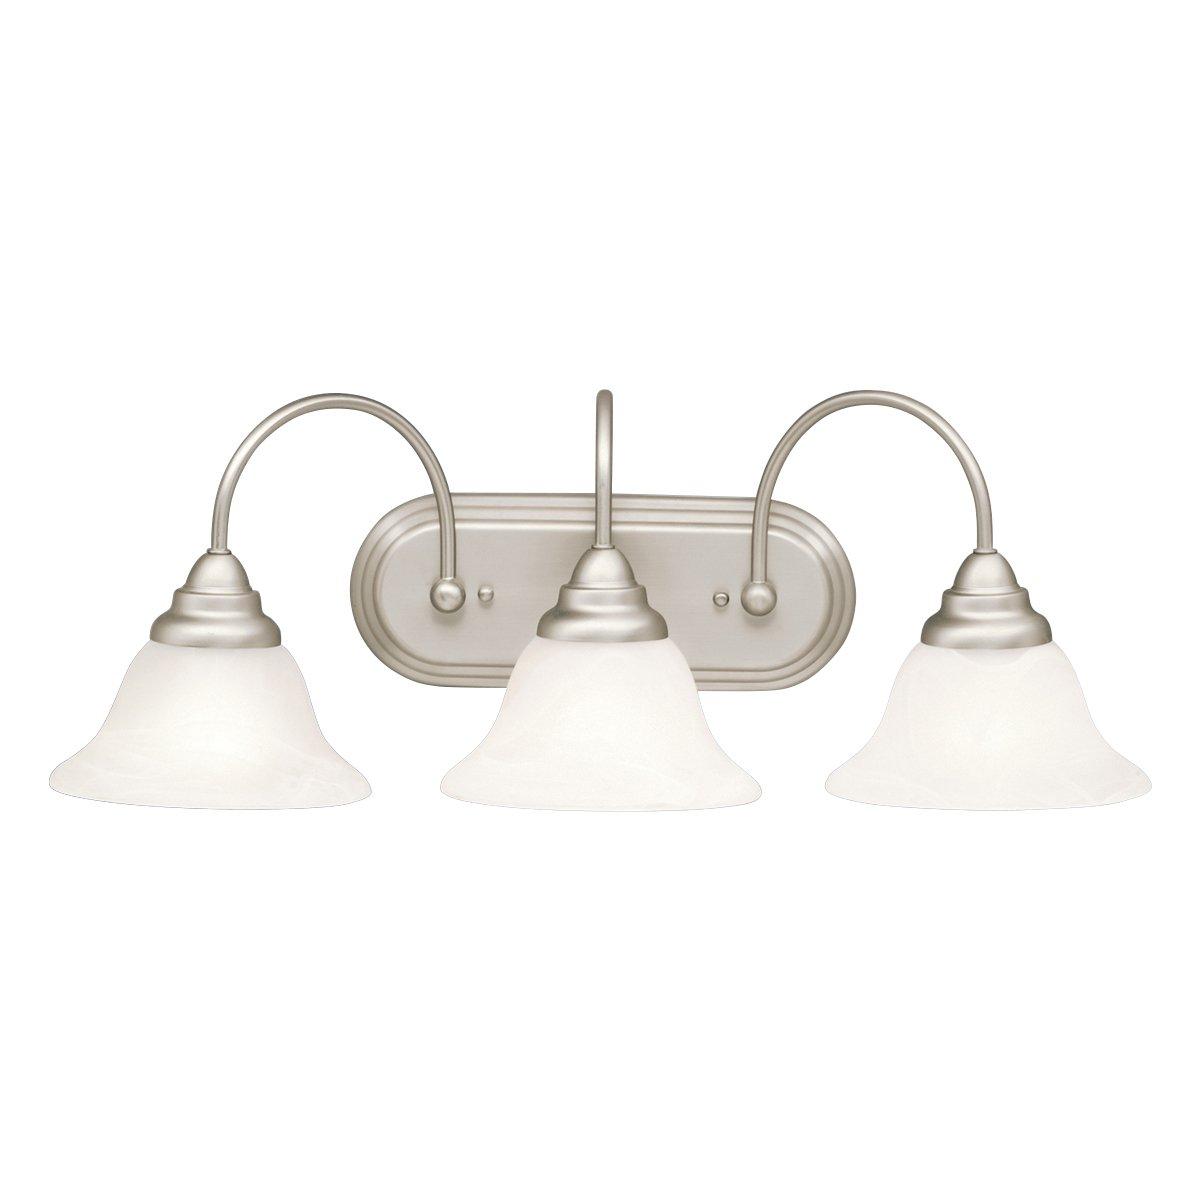 "Kichler 10609NI Bath Vanity Wall Lighting Fixtures, Brushed Nickel 3-Light (25"" W x 10"" H) 39 Watts"